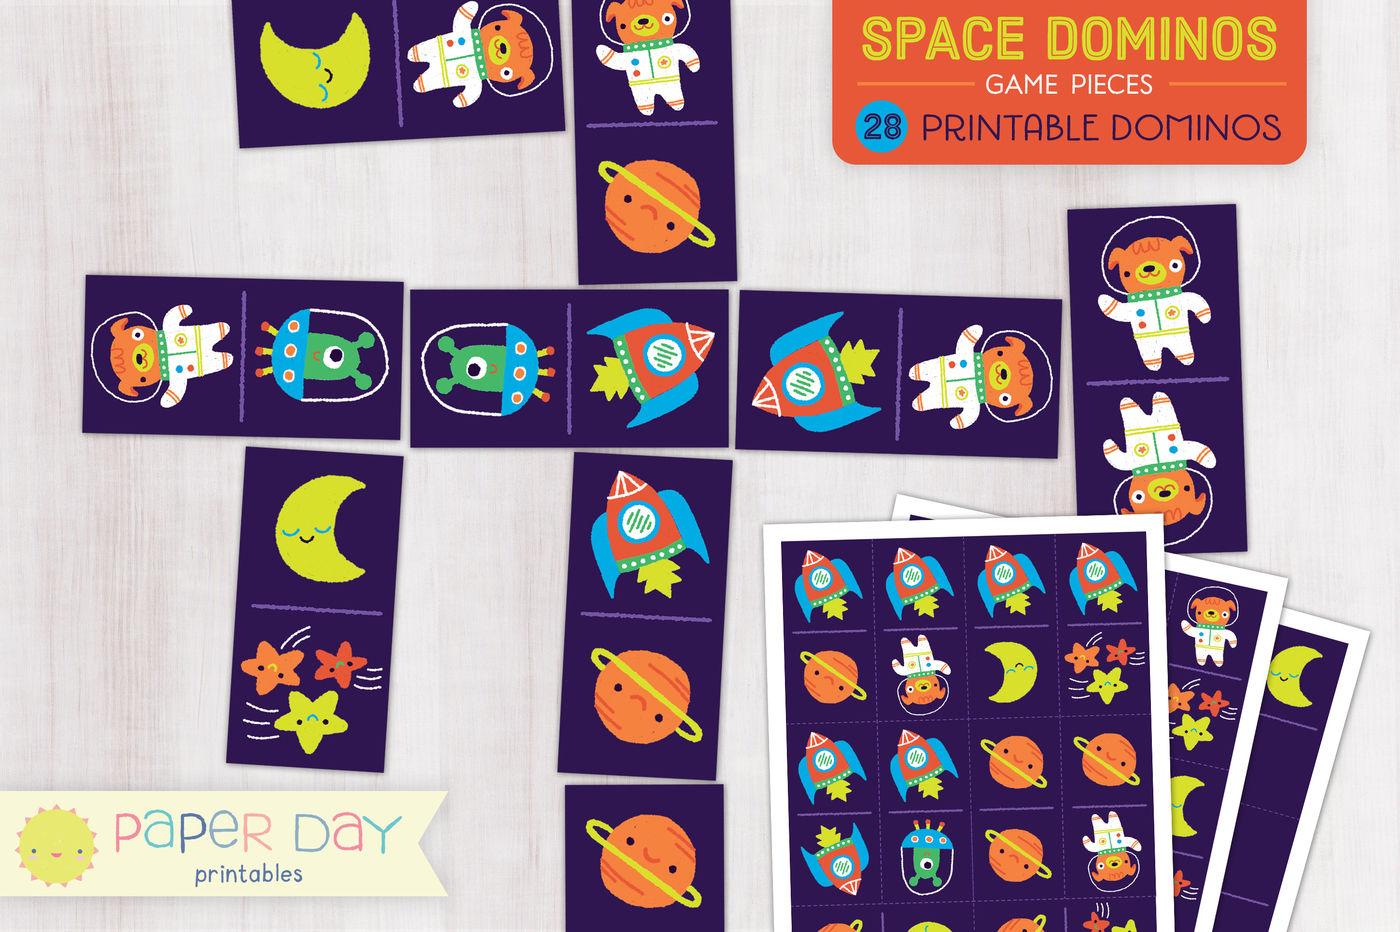 photograph regarding Printable Dominos named Printable Spot Dominos Recreation Through Paper Working day Printables